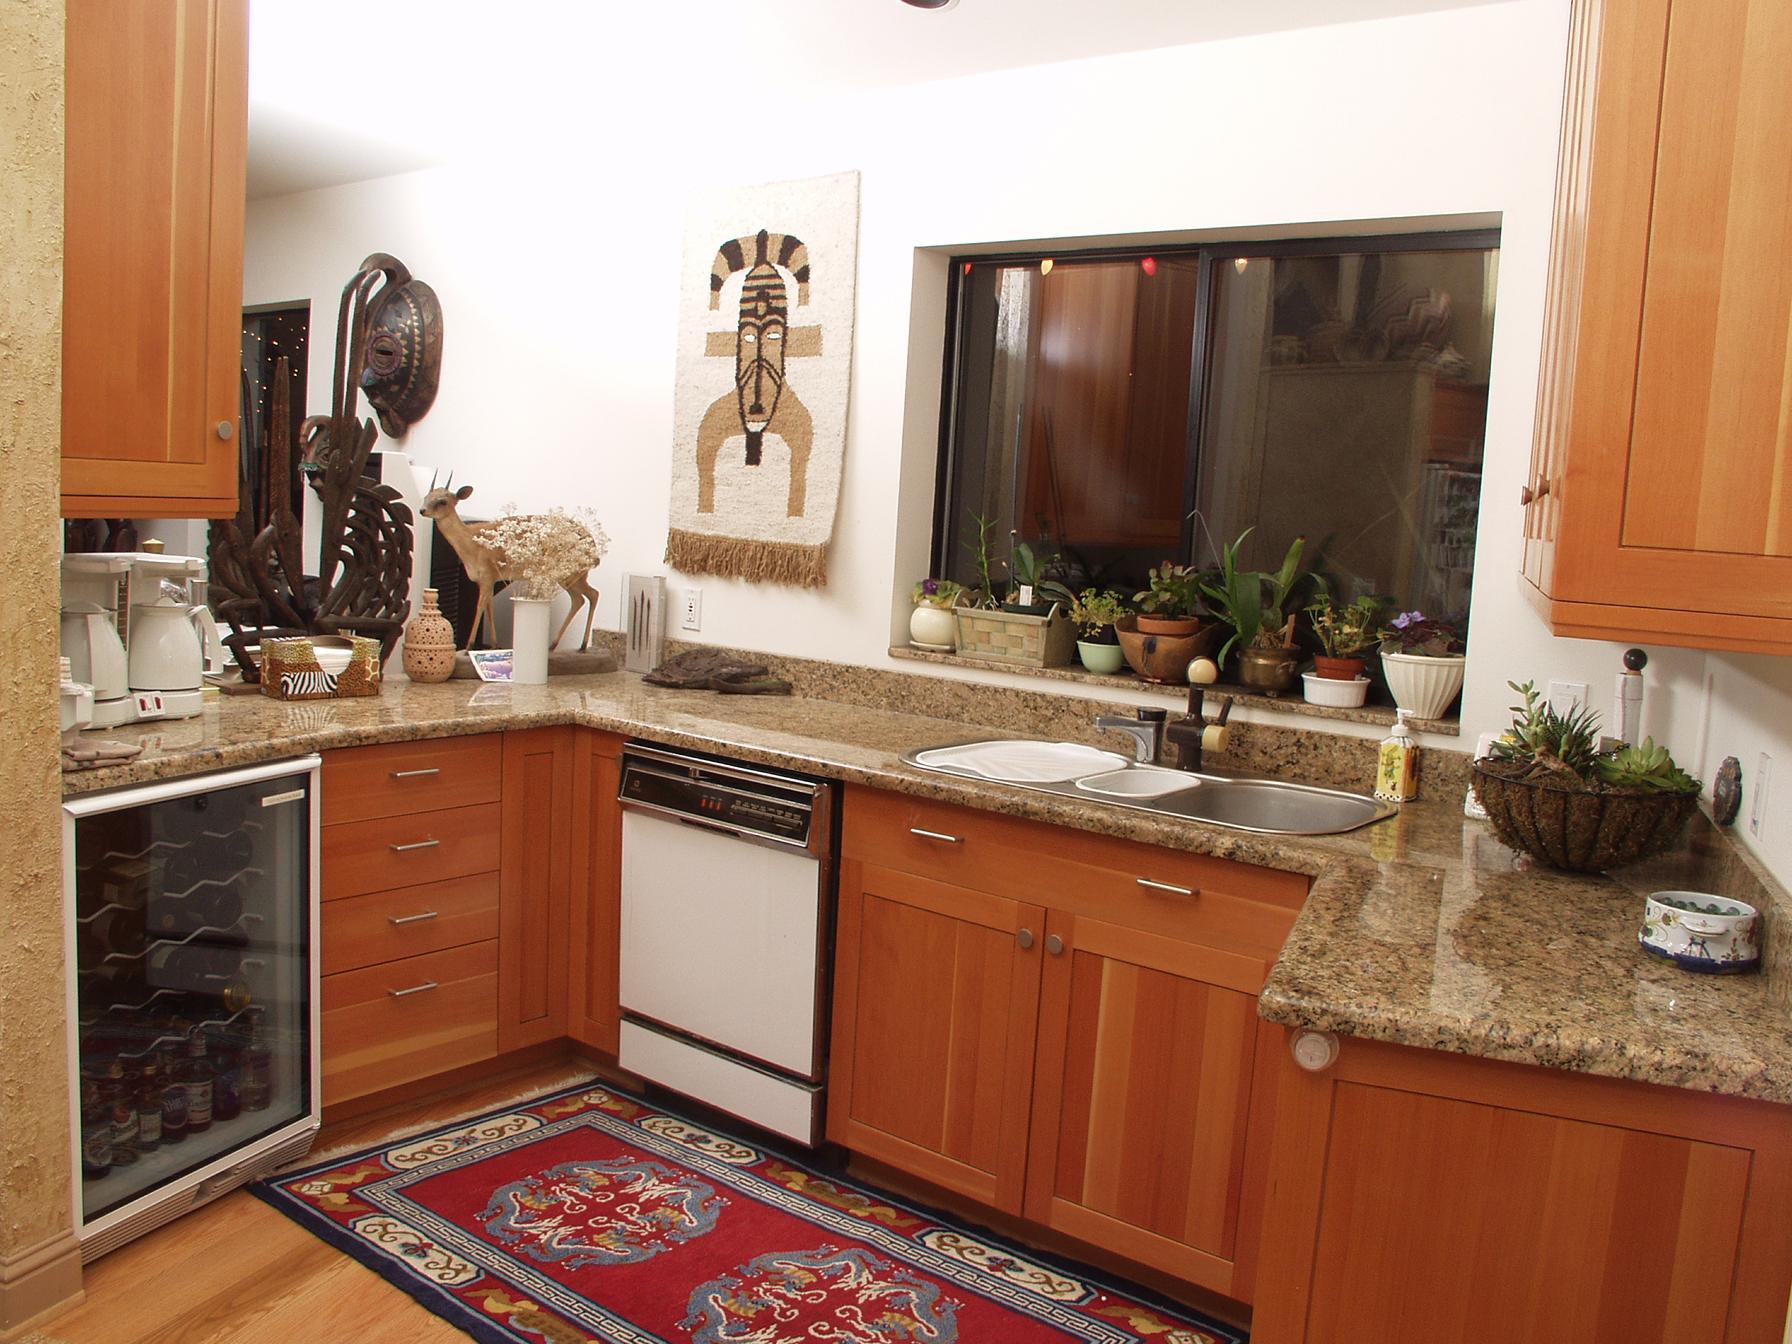 kitchen in giallo veneziano.JPG